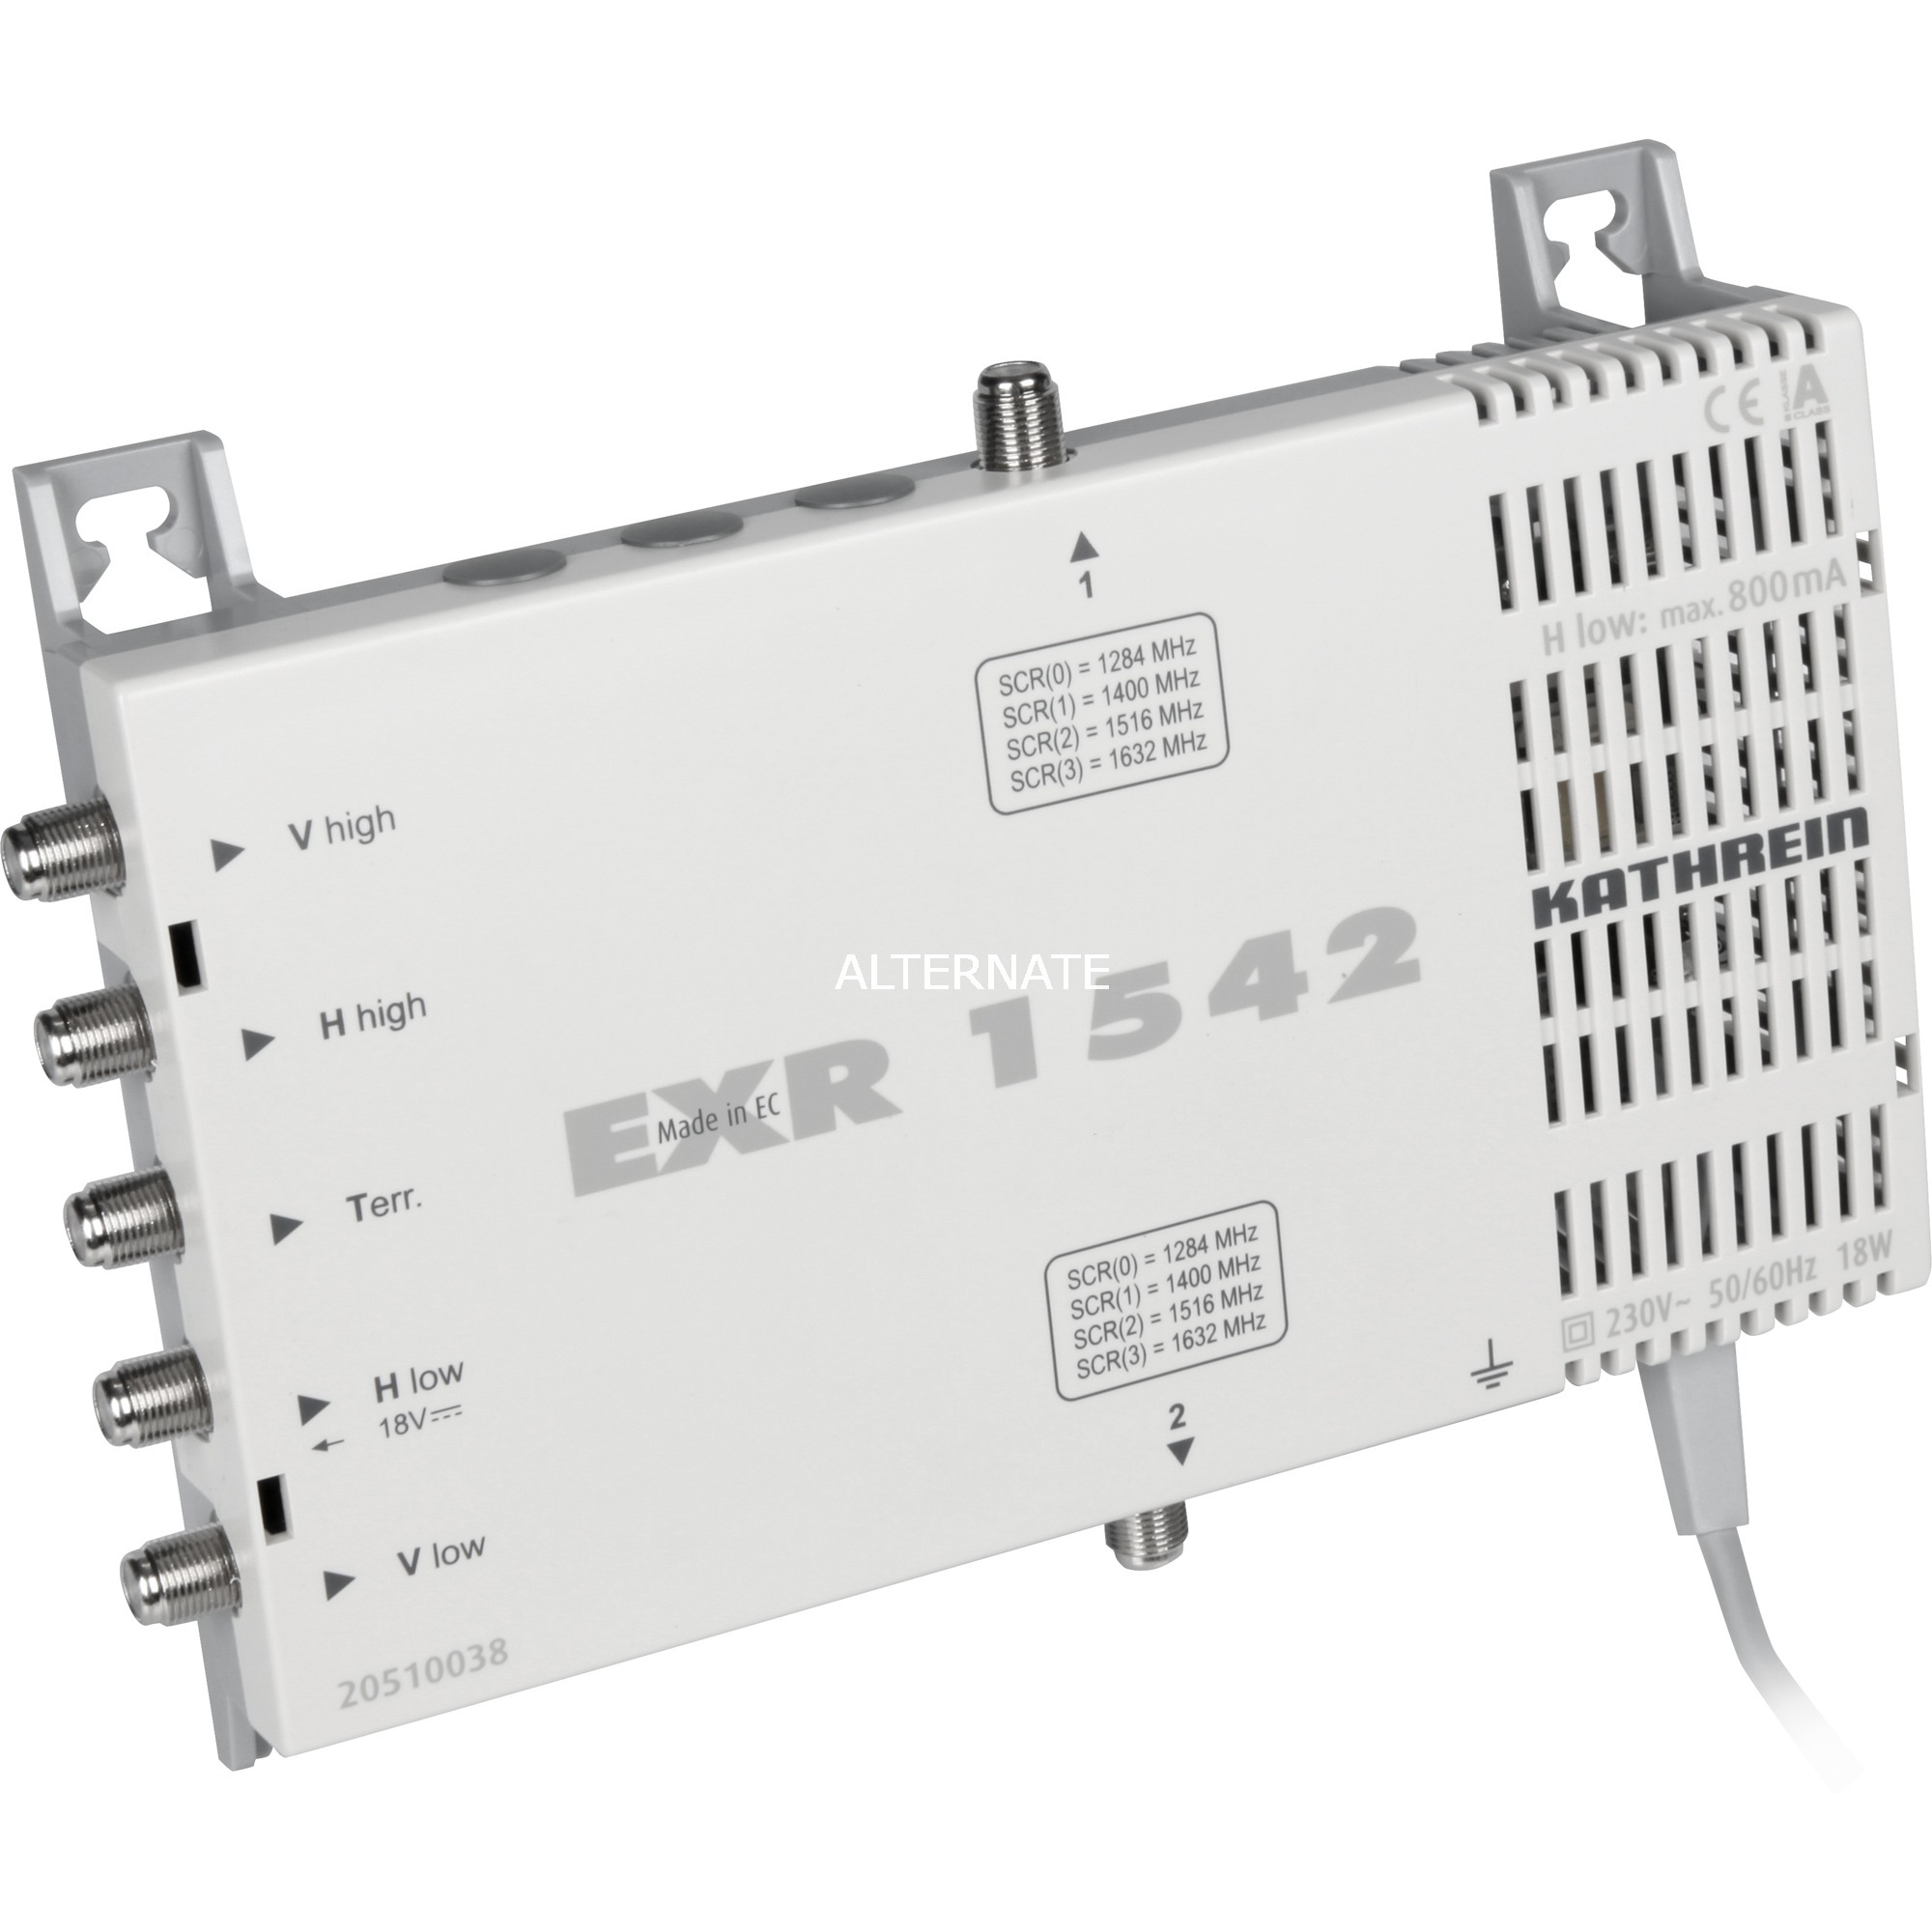 EXR 1542 conmutador múltiple para satélite 5 Entradas 2 Salidas, Interruptor múltiple